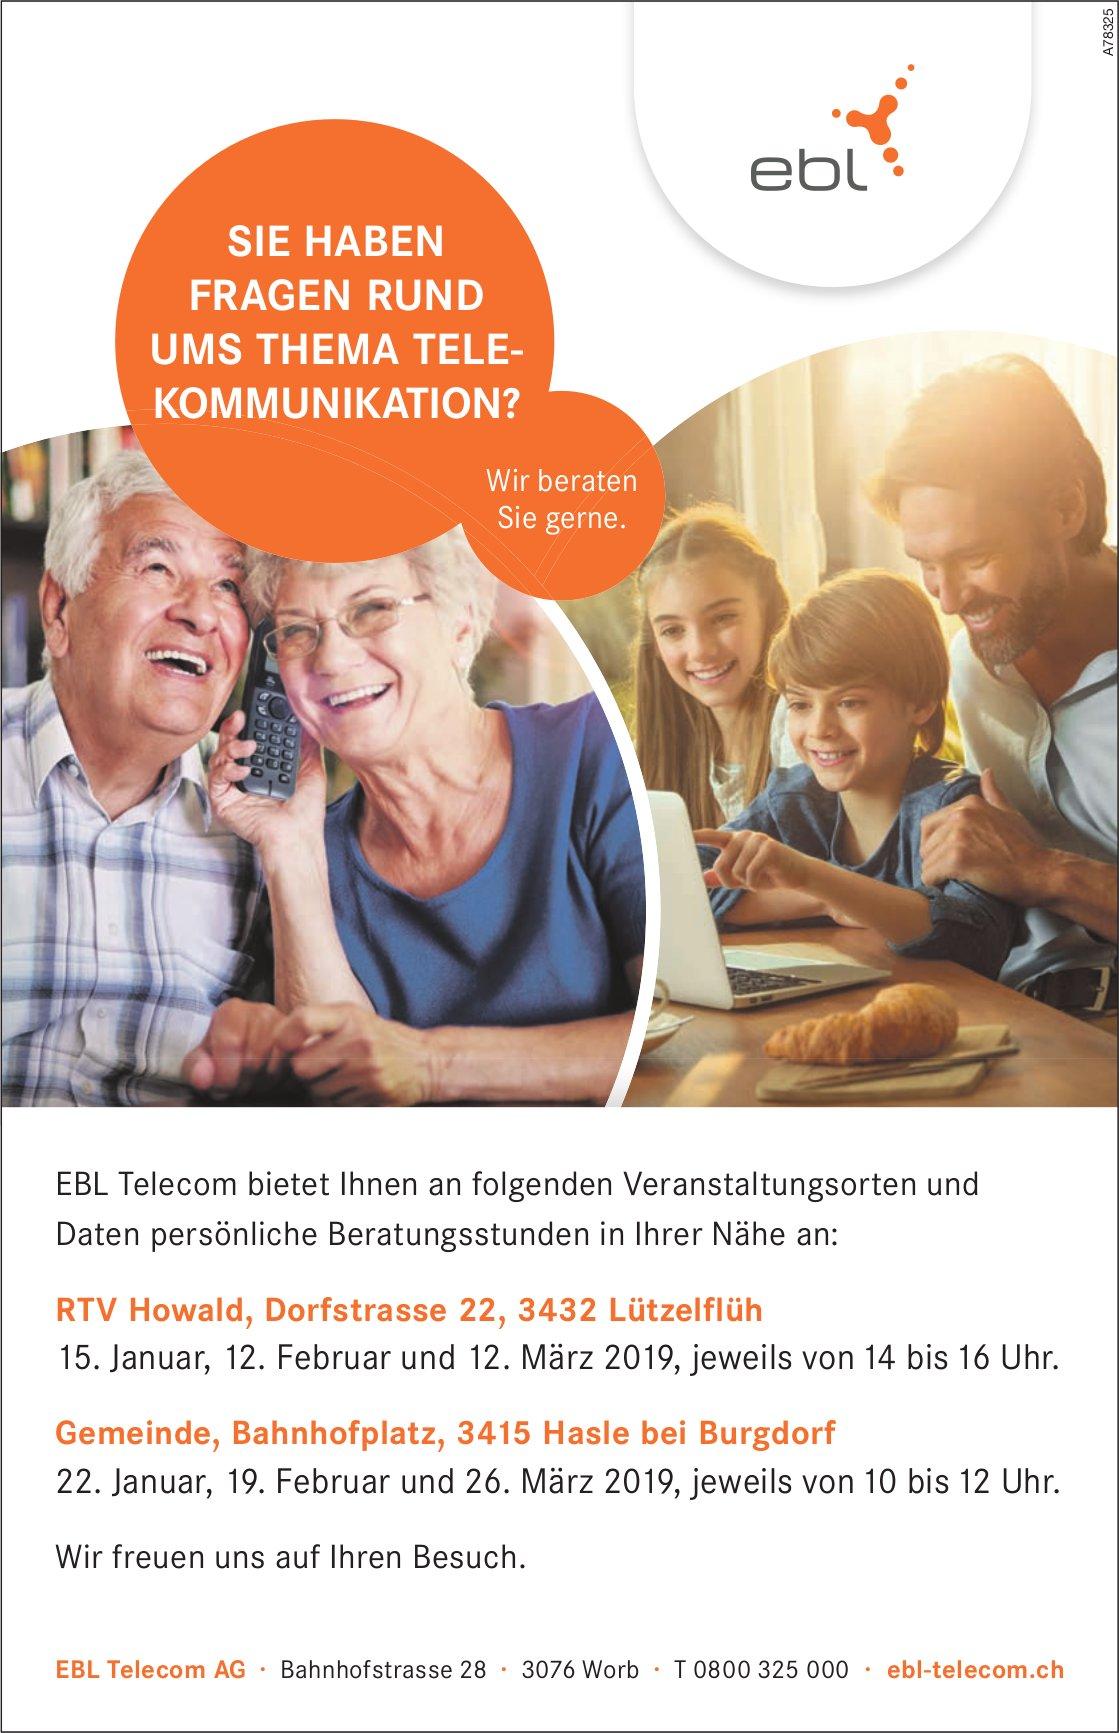 EBL Telecom, persönliche Beratungsstunden, 12./19. Februar & 12./26. März, Lützelflüh & Hasle . B.